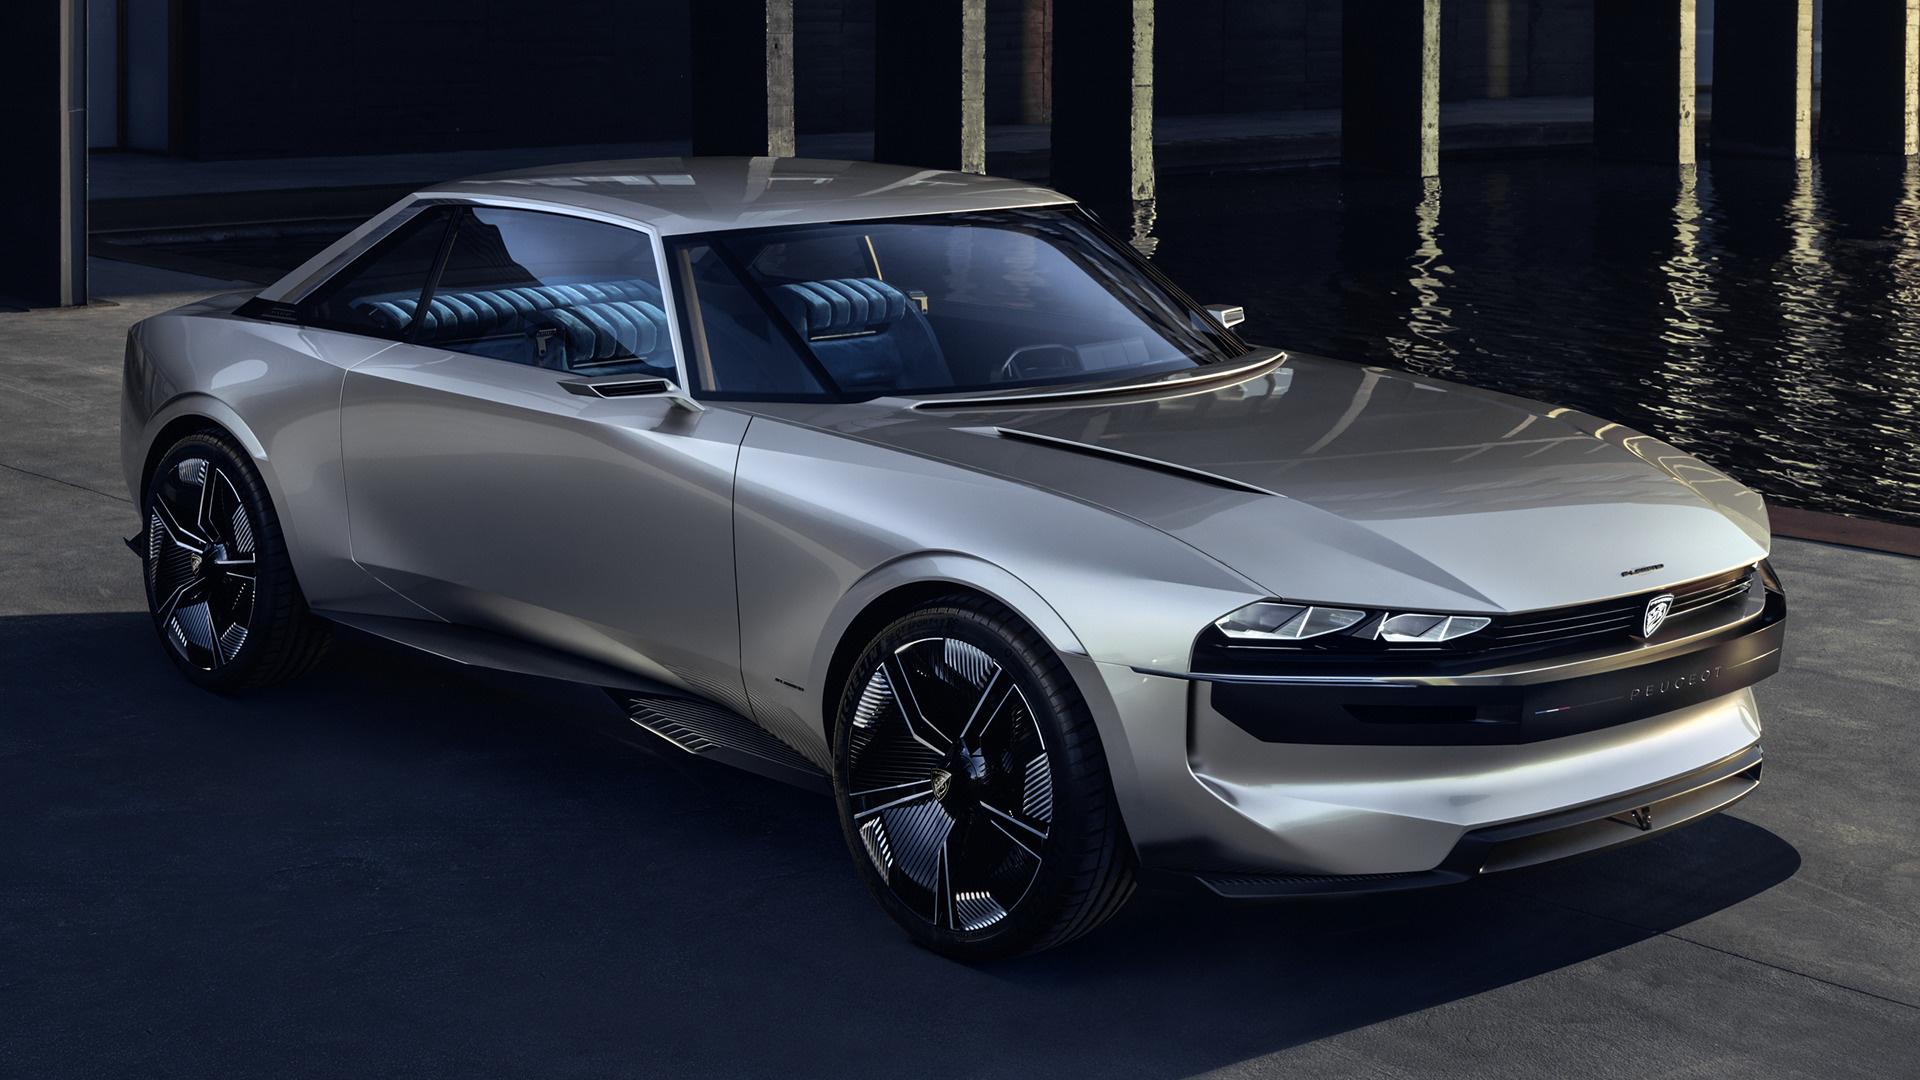 Amg Gt Concept >> Car Wallpapers and HD Desktop Backgrounds - Car Pixel